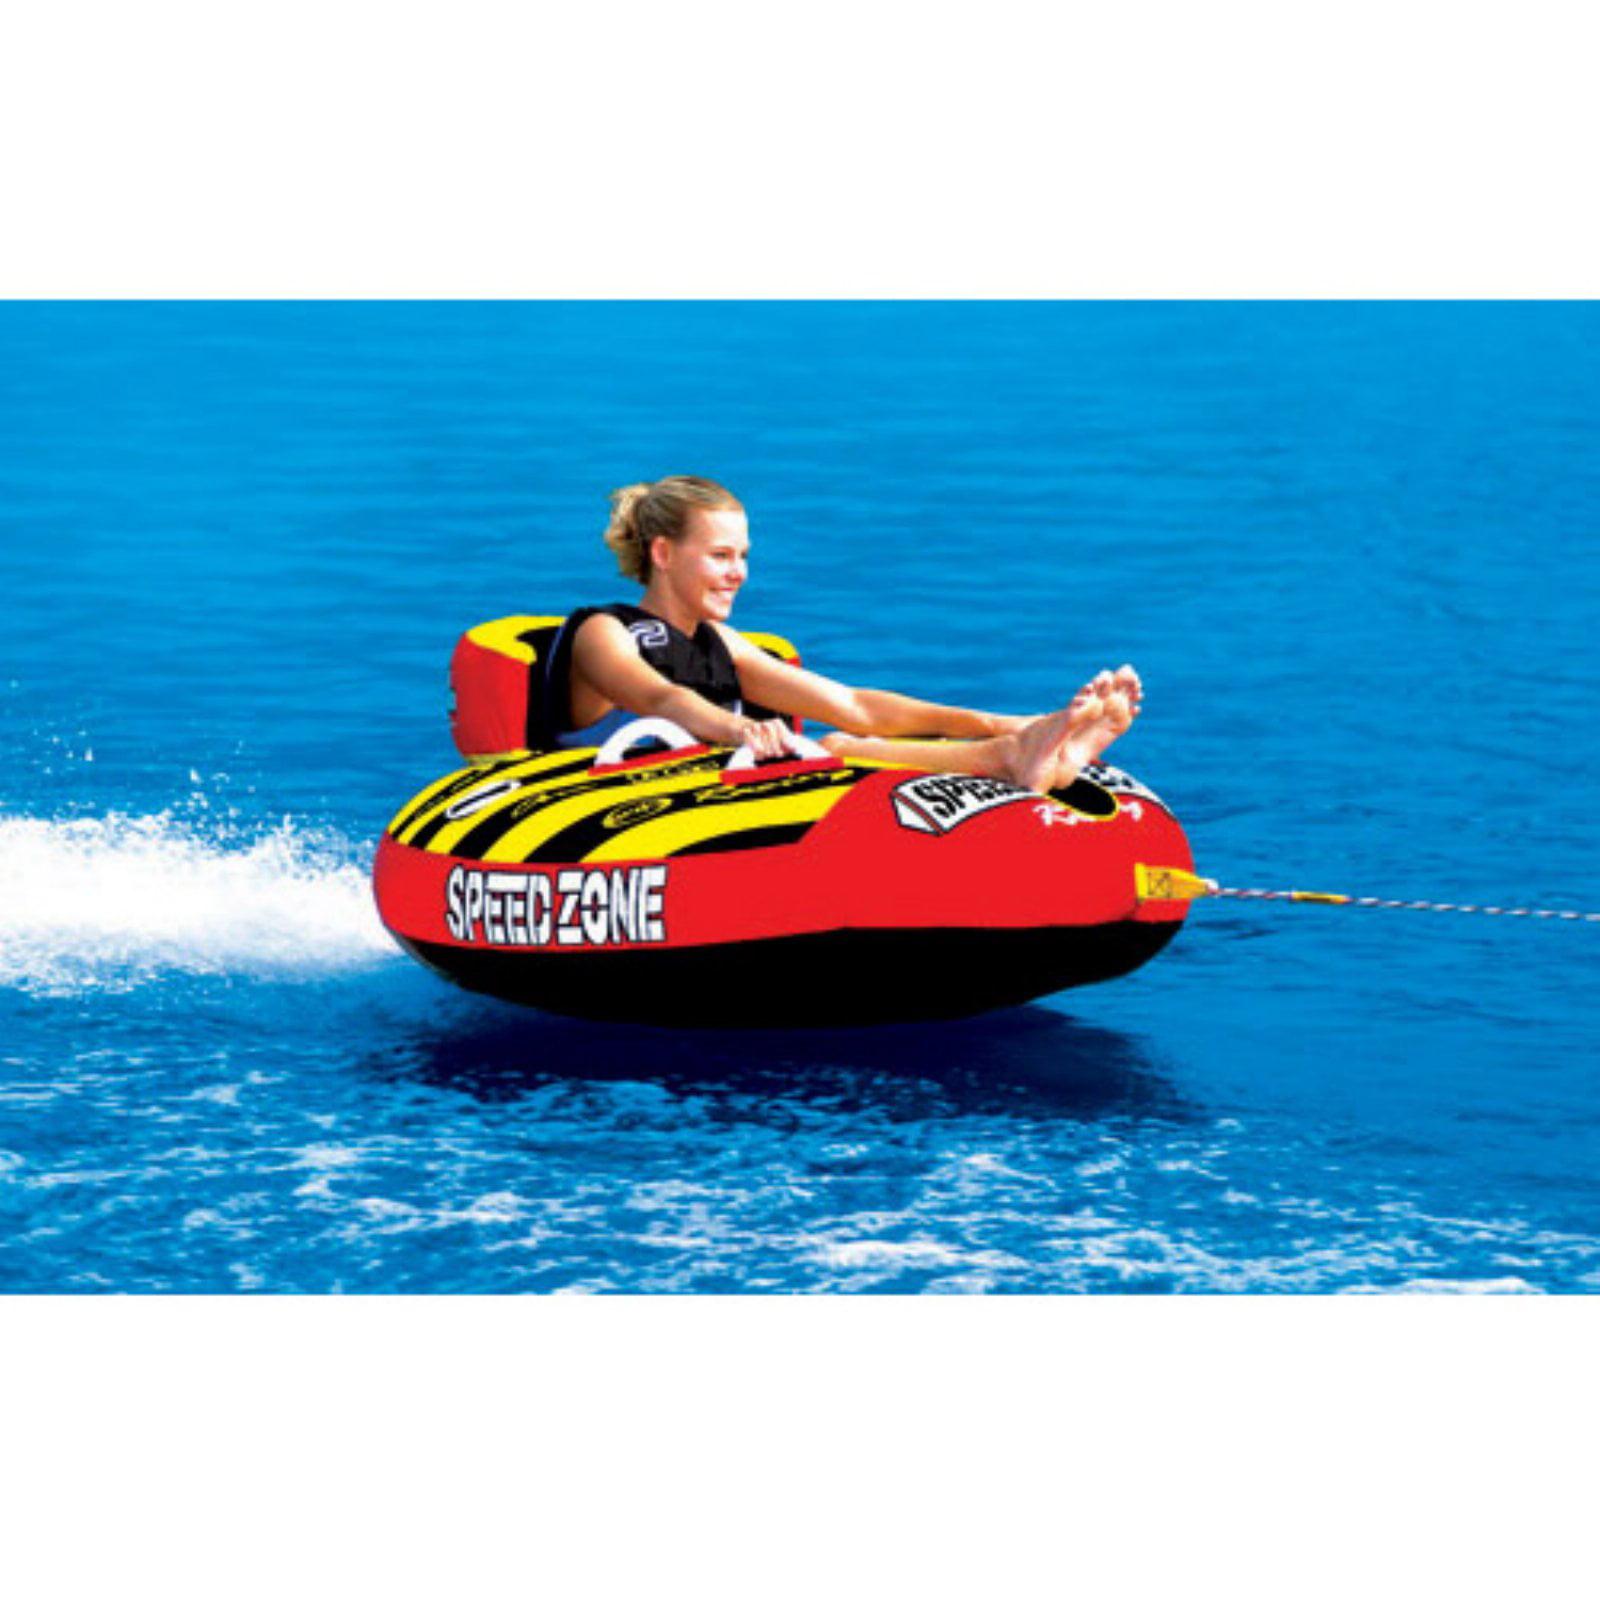 Sportsstuff Speedzone 1 Inflatable Single Rider Towable by Kwik Tek